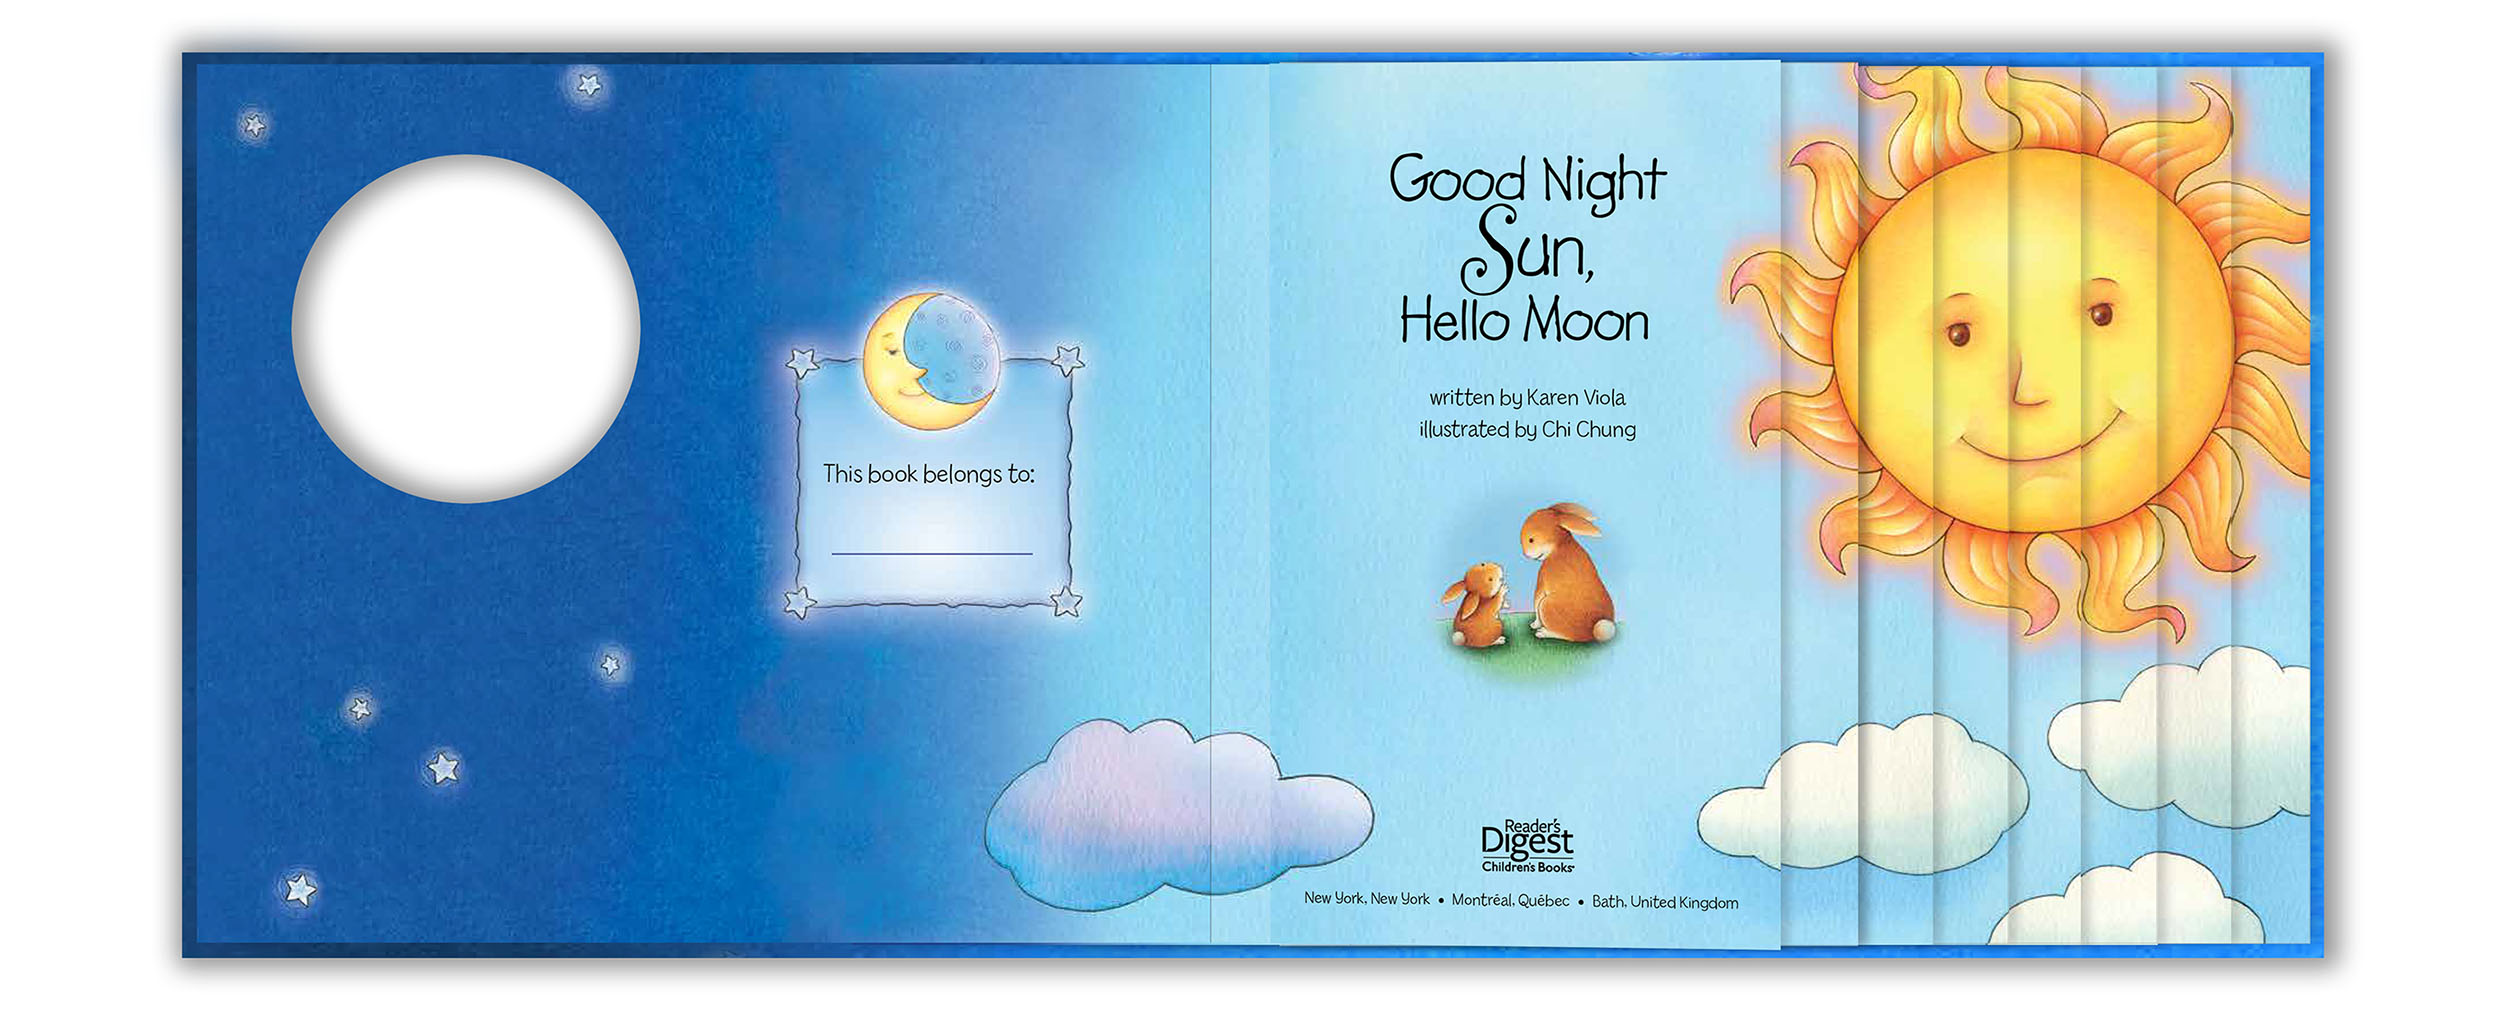 Good Night Sun Hello Moon by Karen Viola